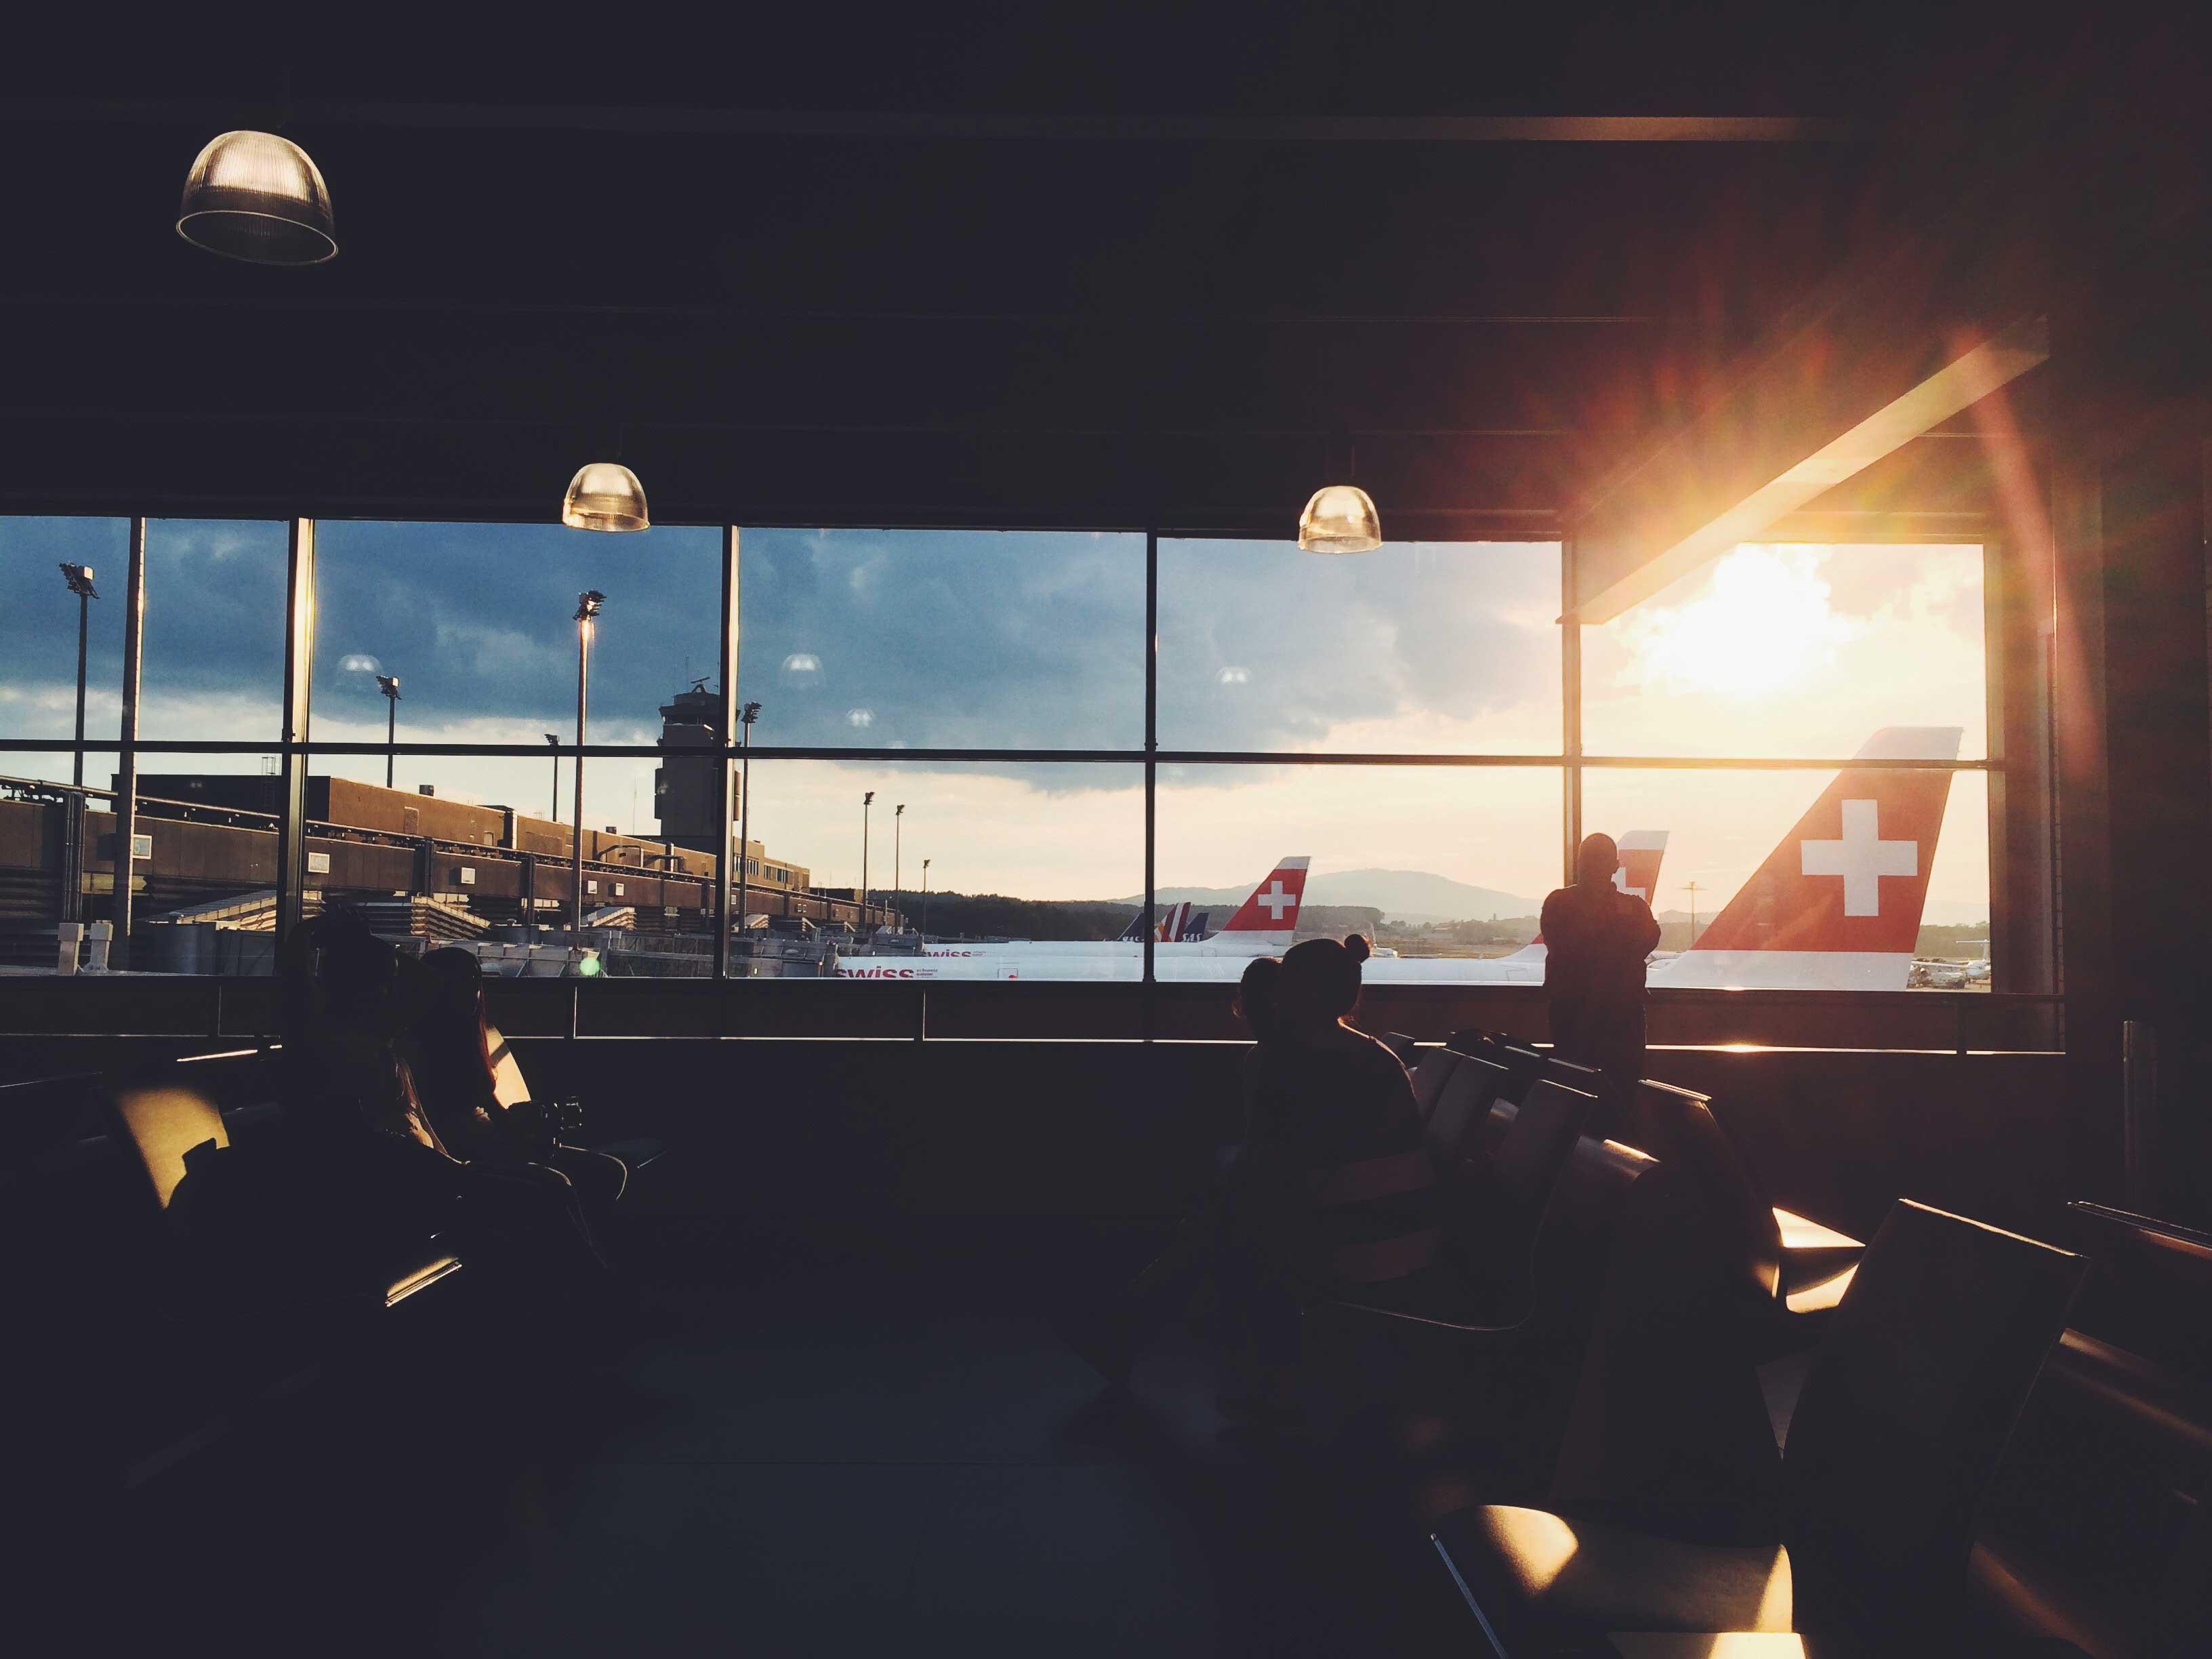 jet -lag airport